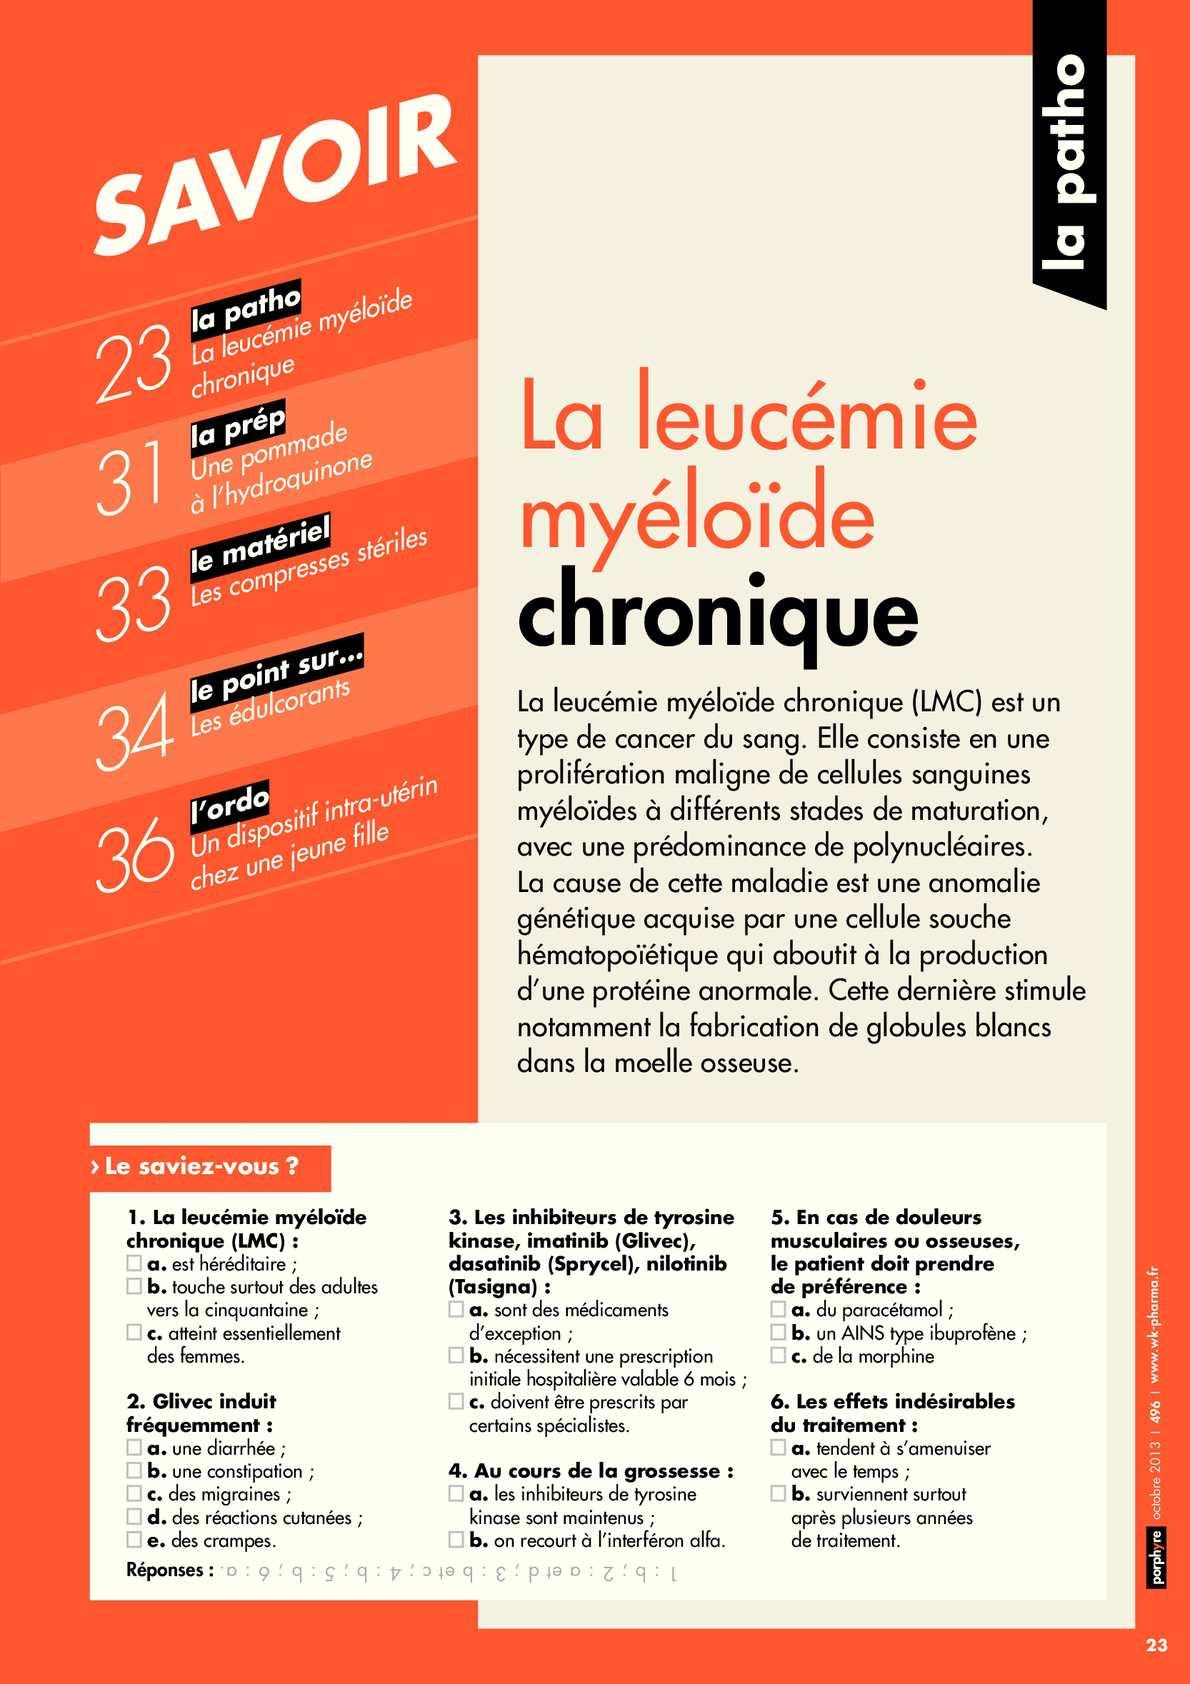 Dossier LMC du mensuel des pharmaciens Porphyre